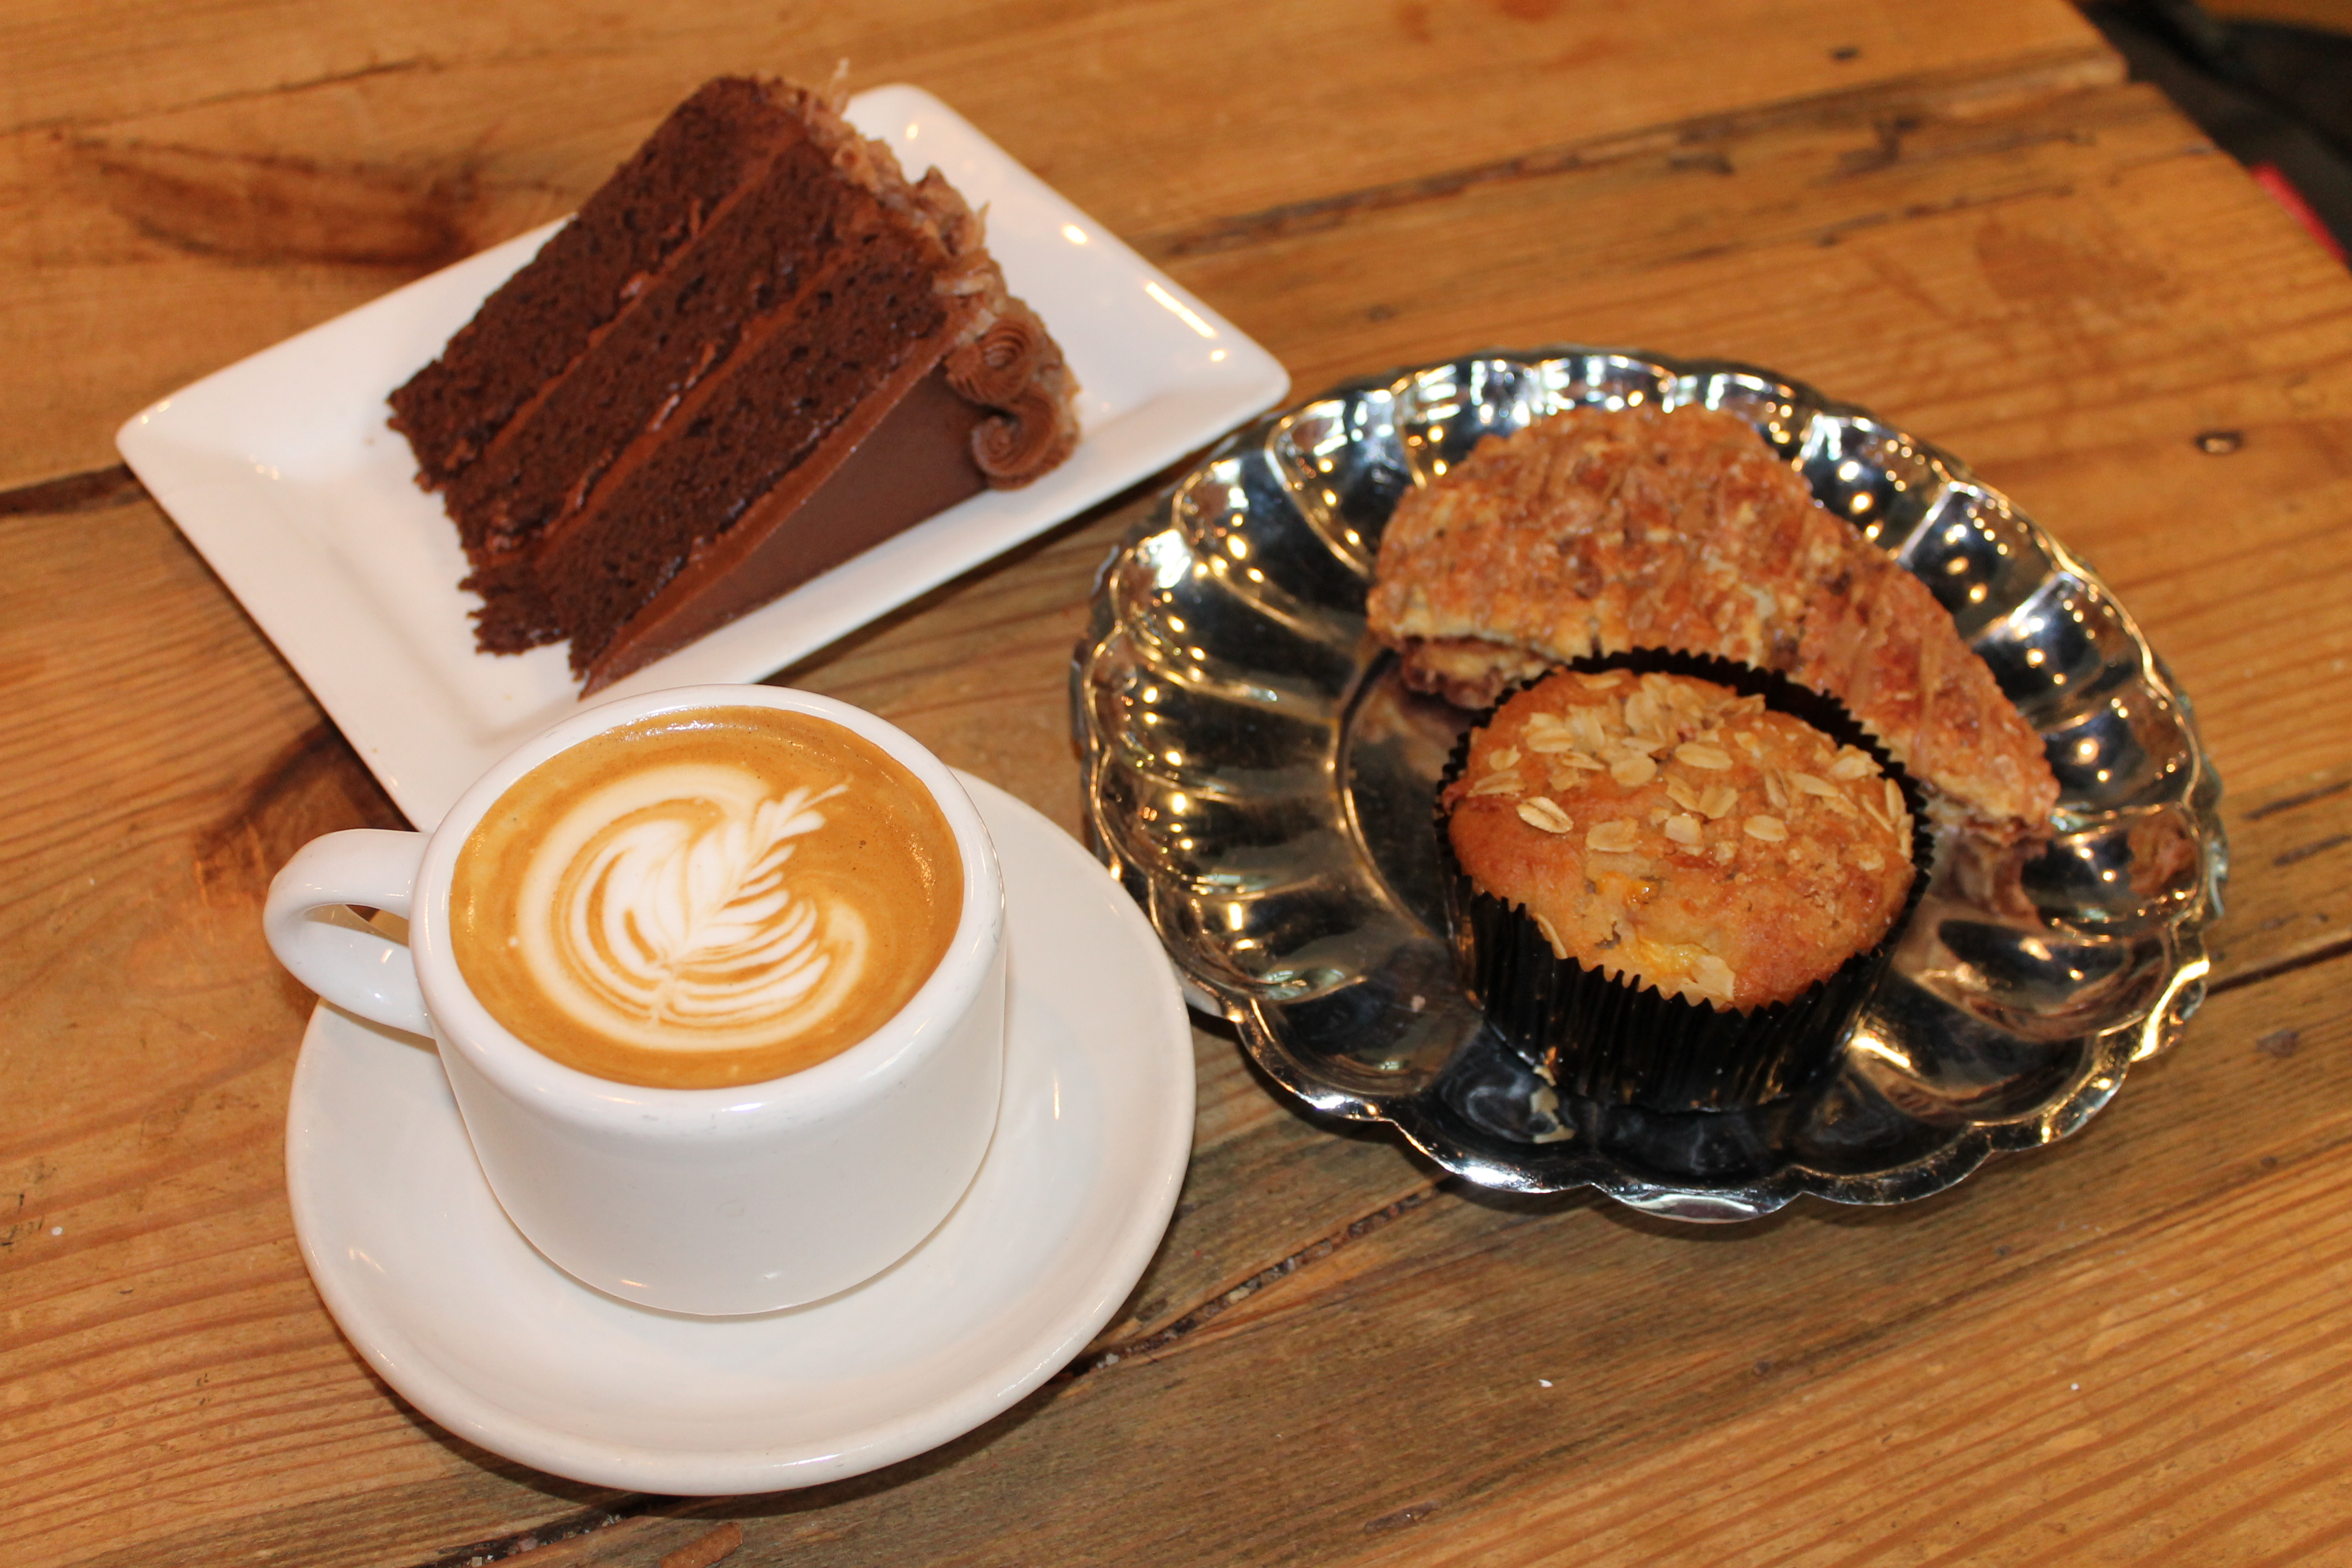 chocolate cake, muffin, cappuccino, cinnamon crumble cake